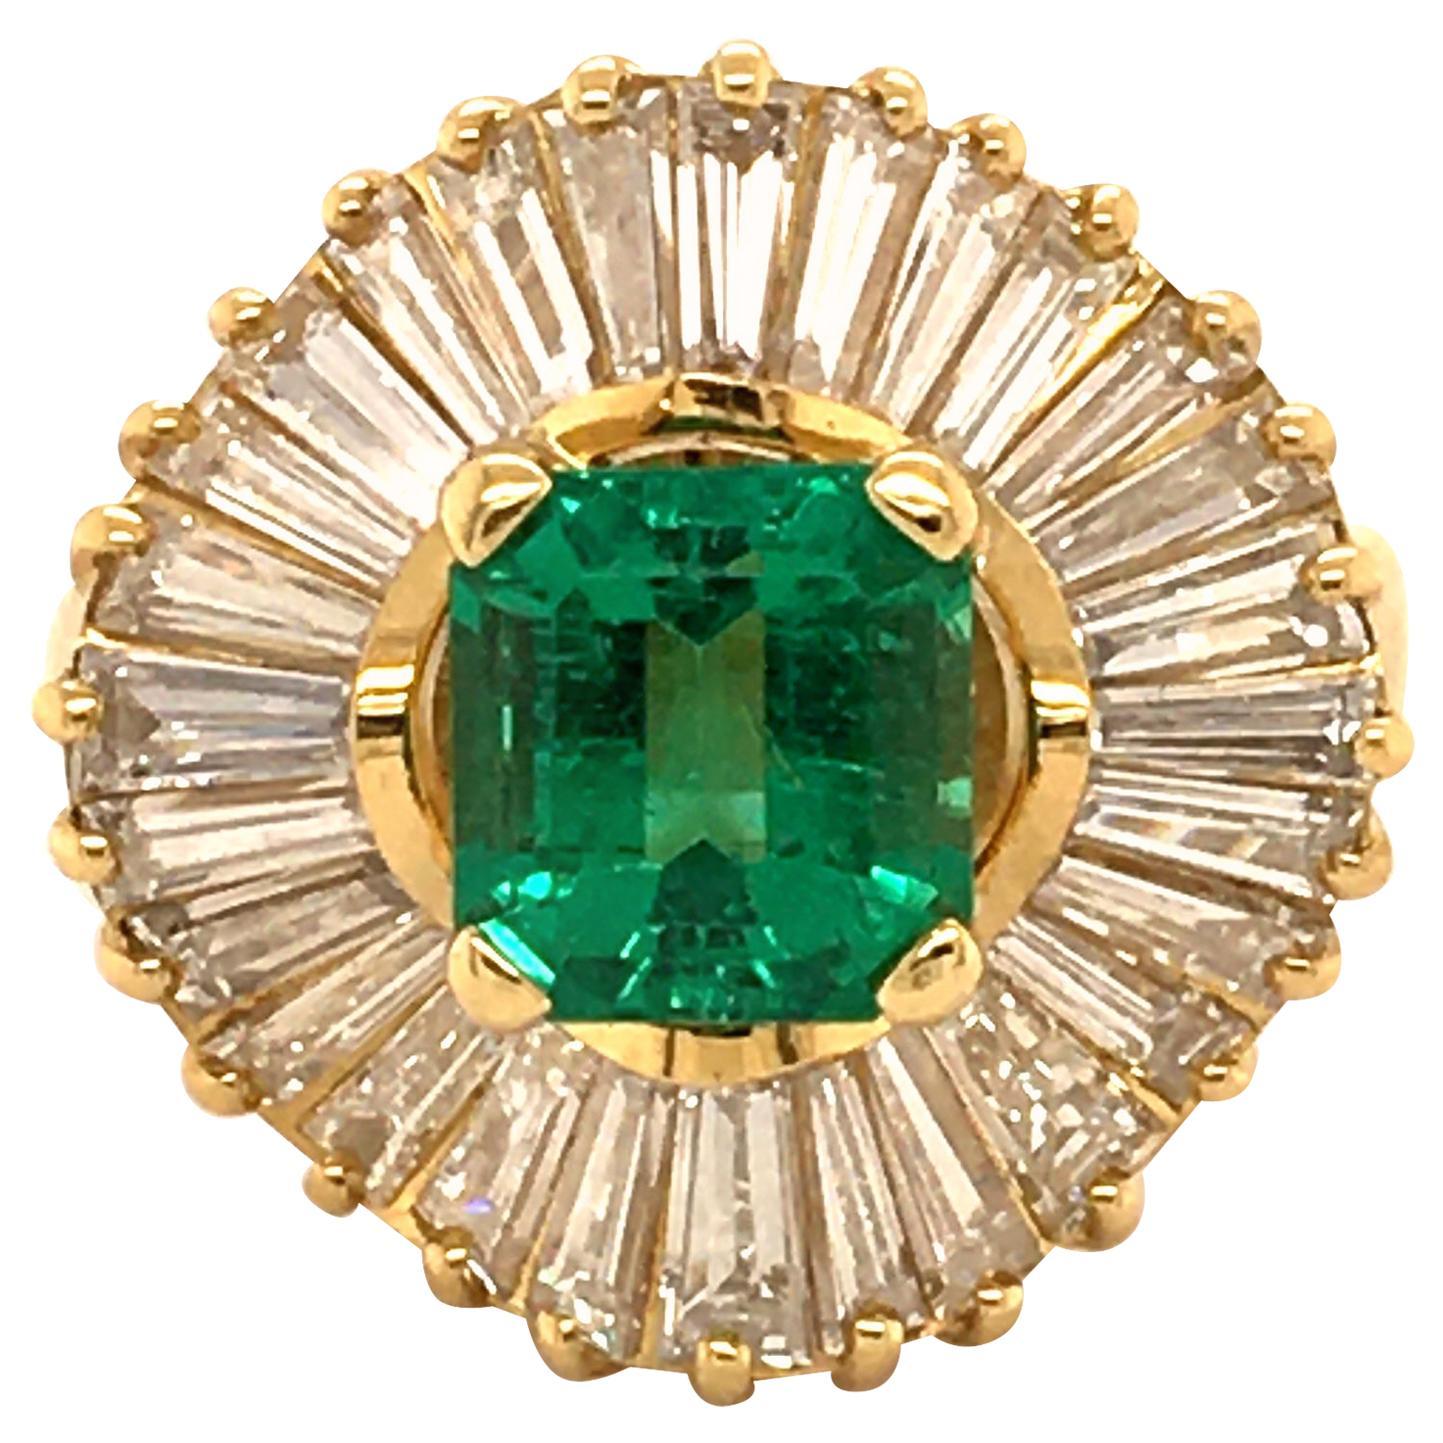 Emerald and Diamond Ballerina Ring in 18 Karat Yellow Gold